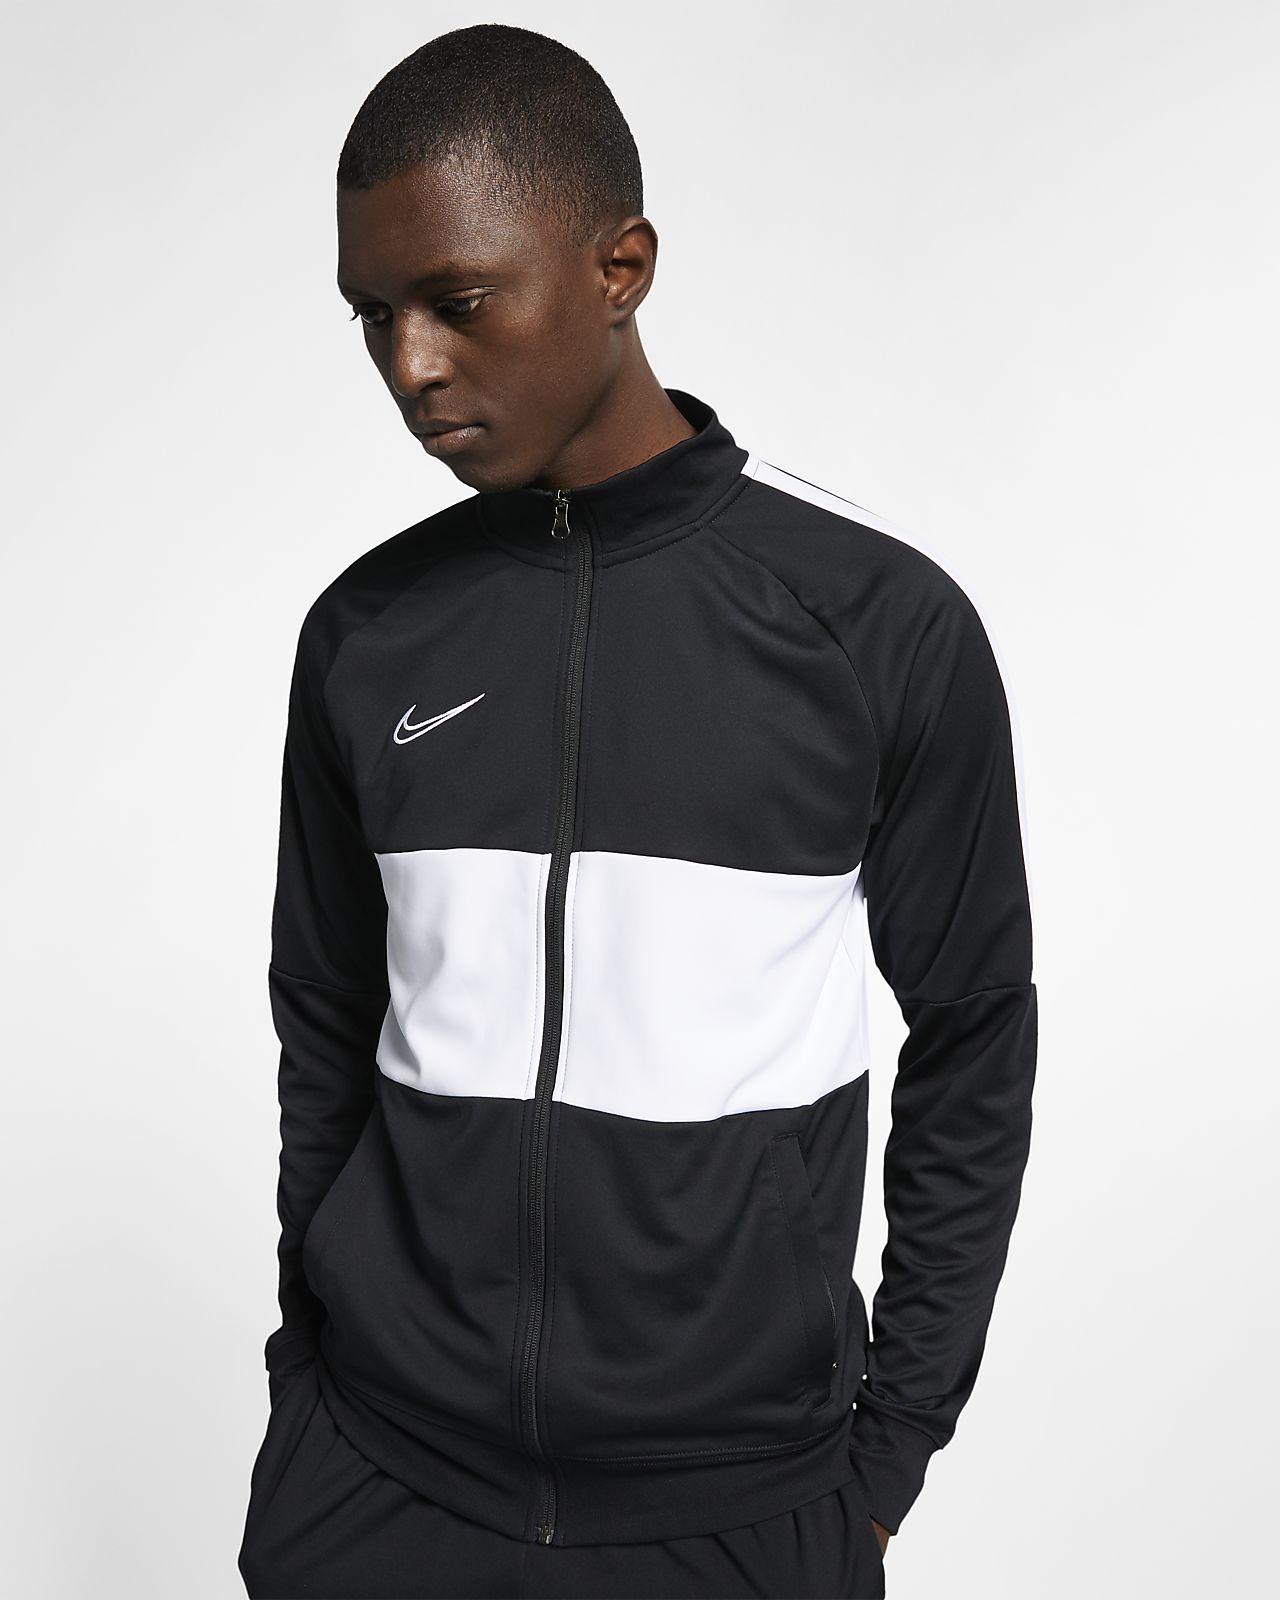 Fit Academy Hombre Fútbol Nike Chaqueta Dri De SpUMjVGqLz